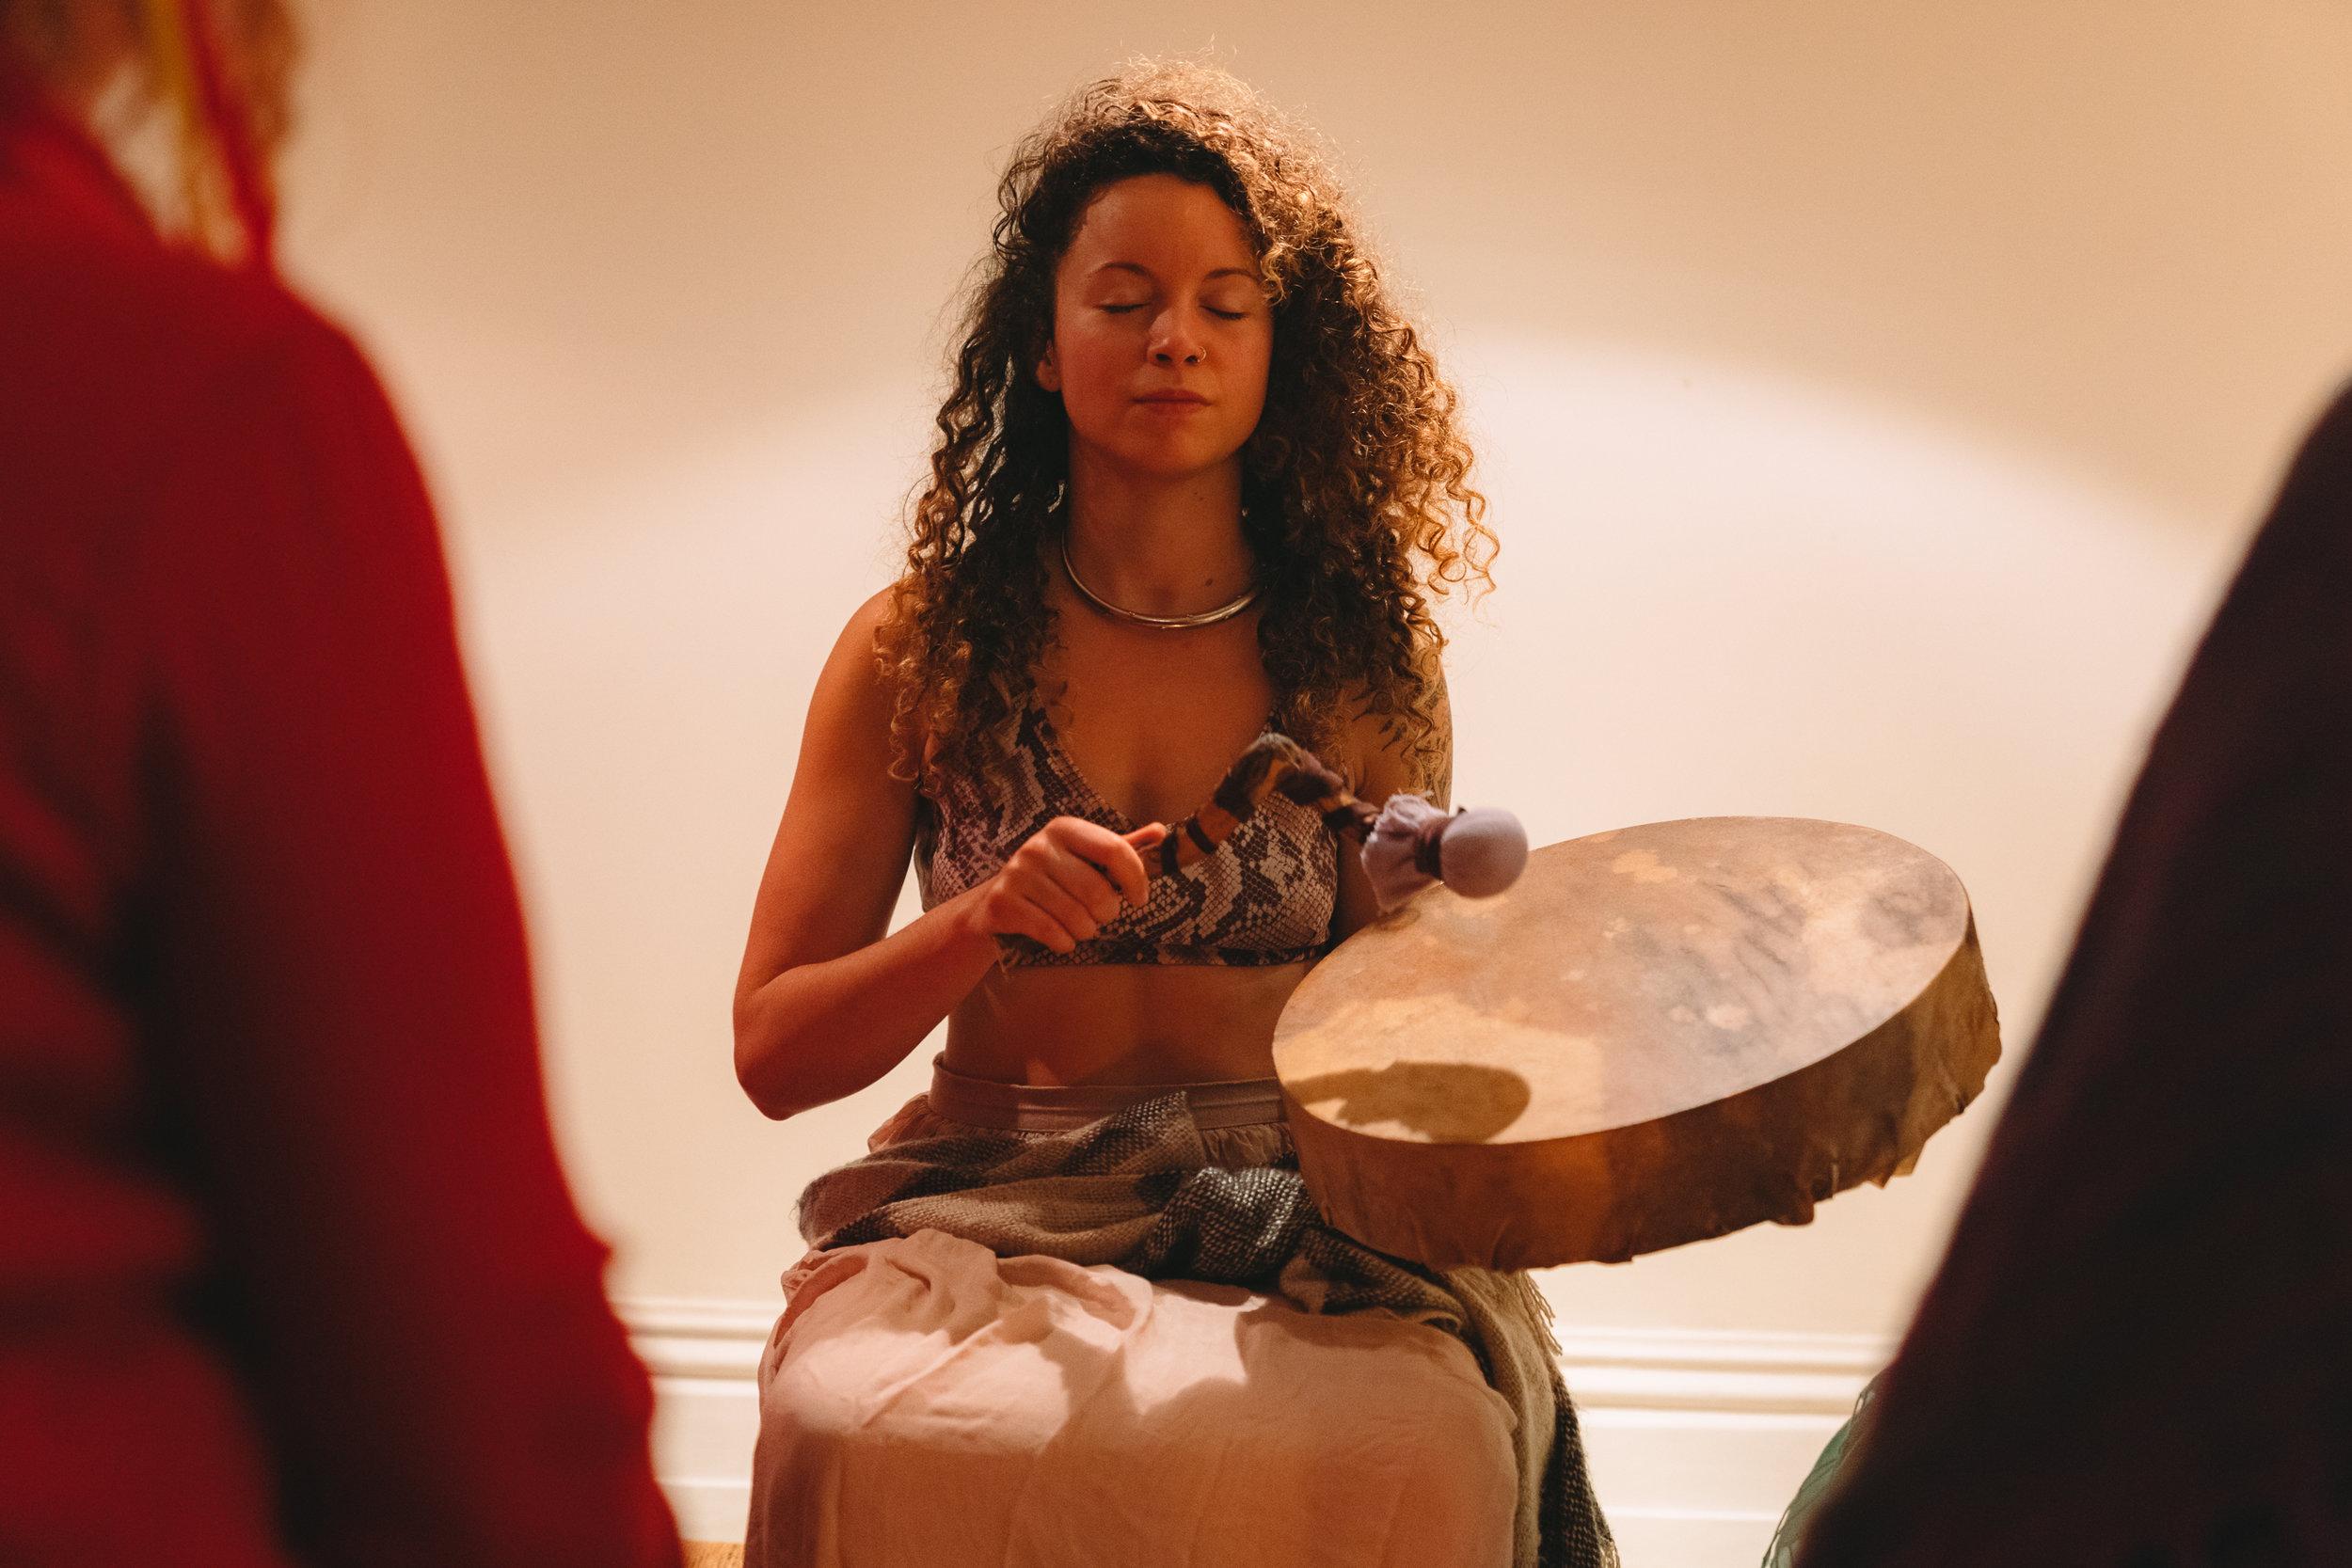 Ceremony & Ritual